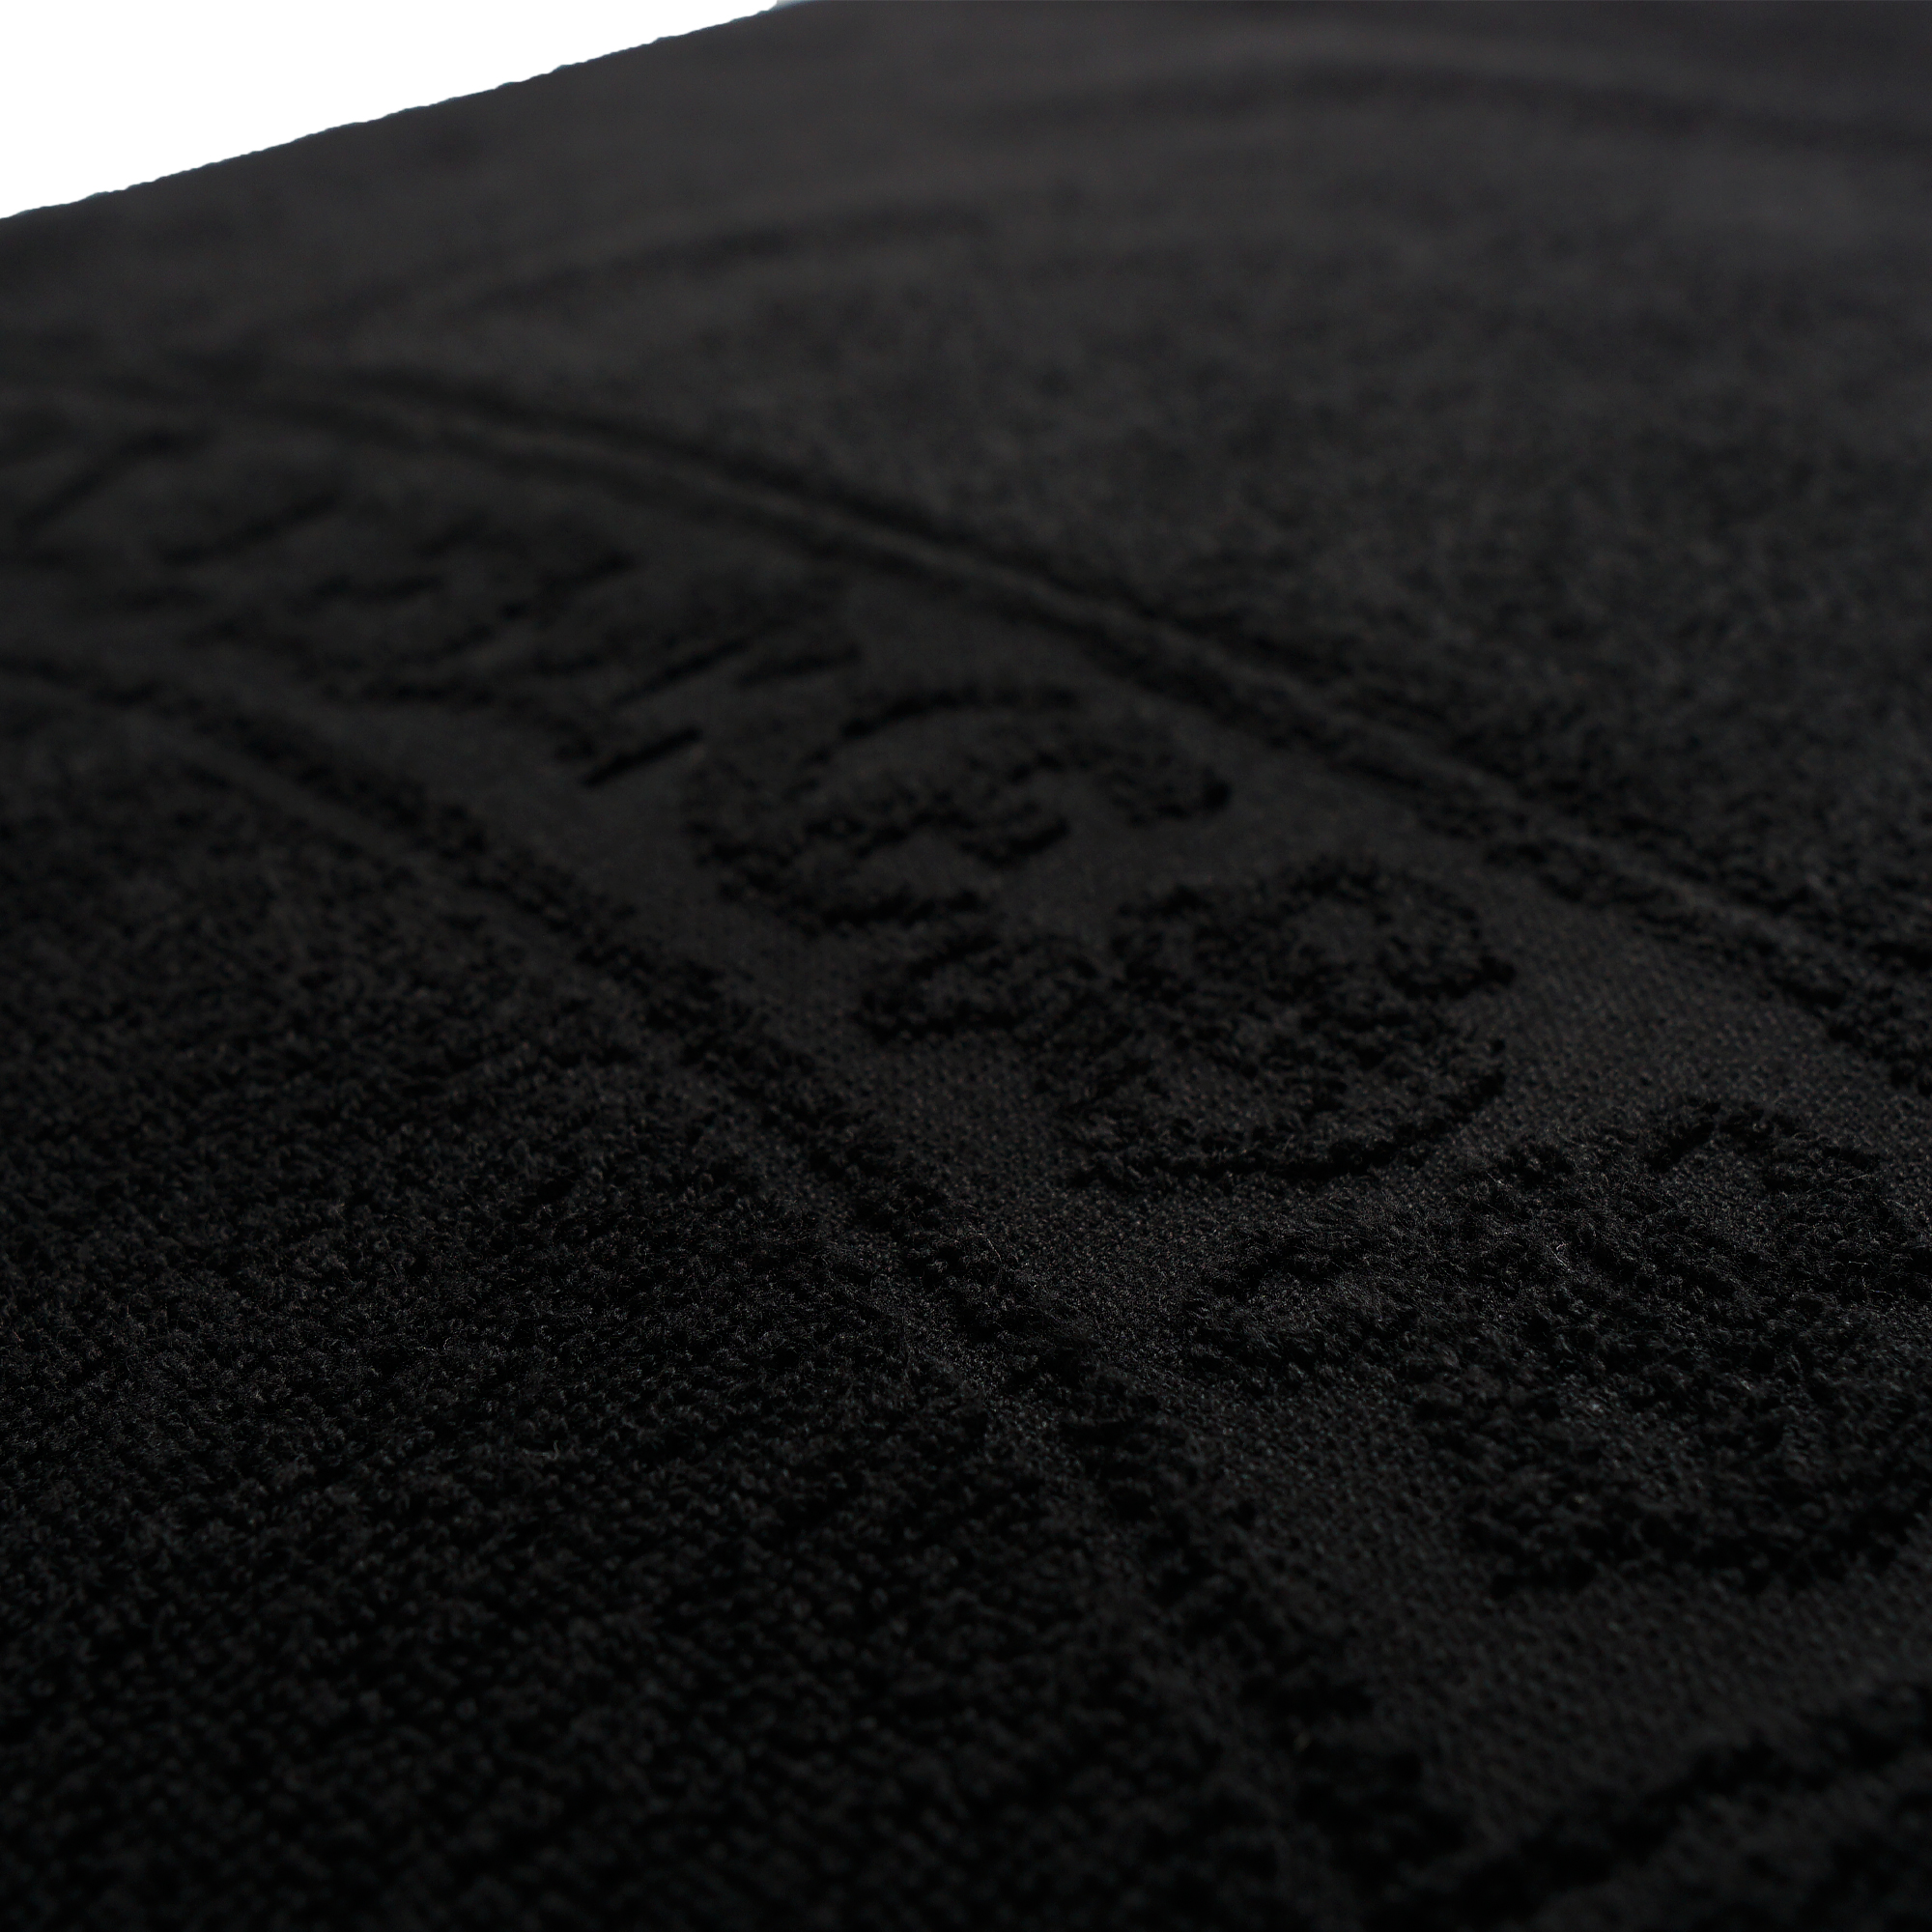 lawless-towel-mini-detail-2